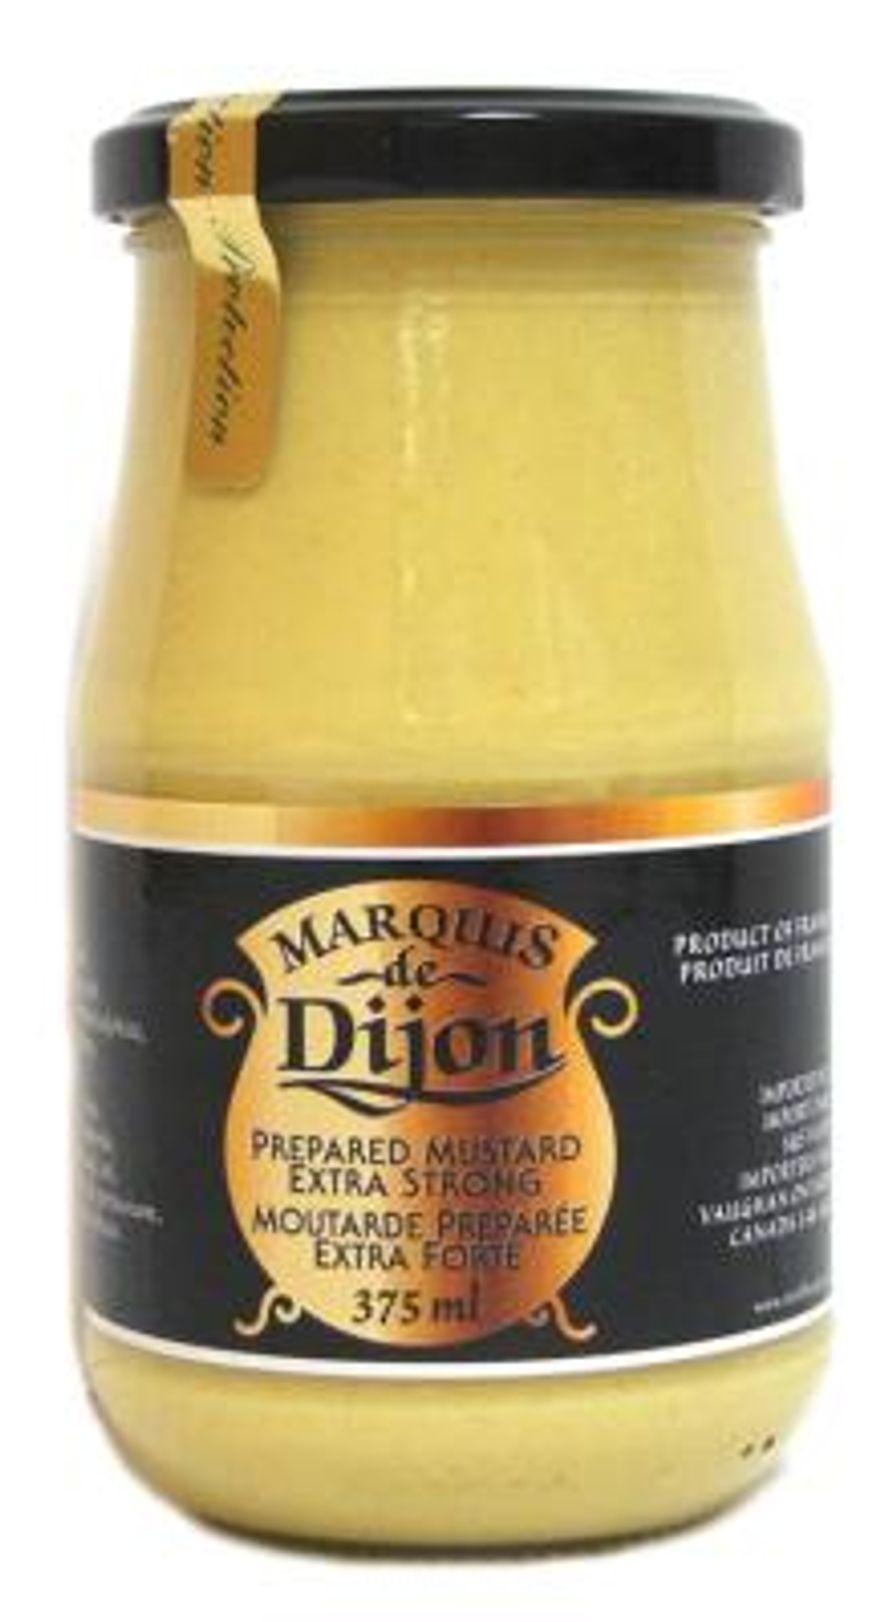 Marquis Smooth Dijon 375 ml